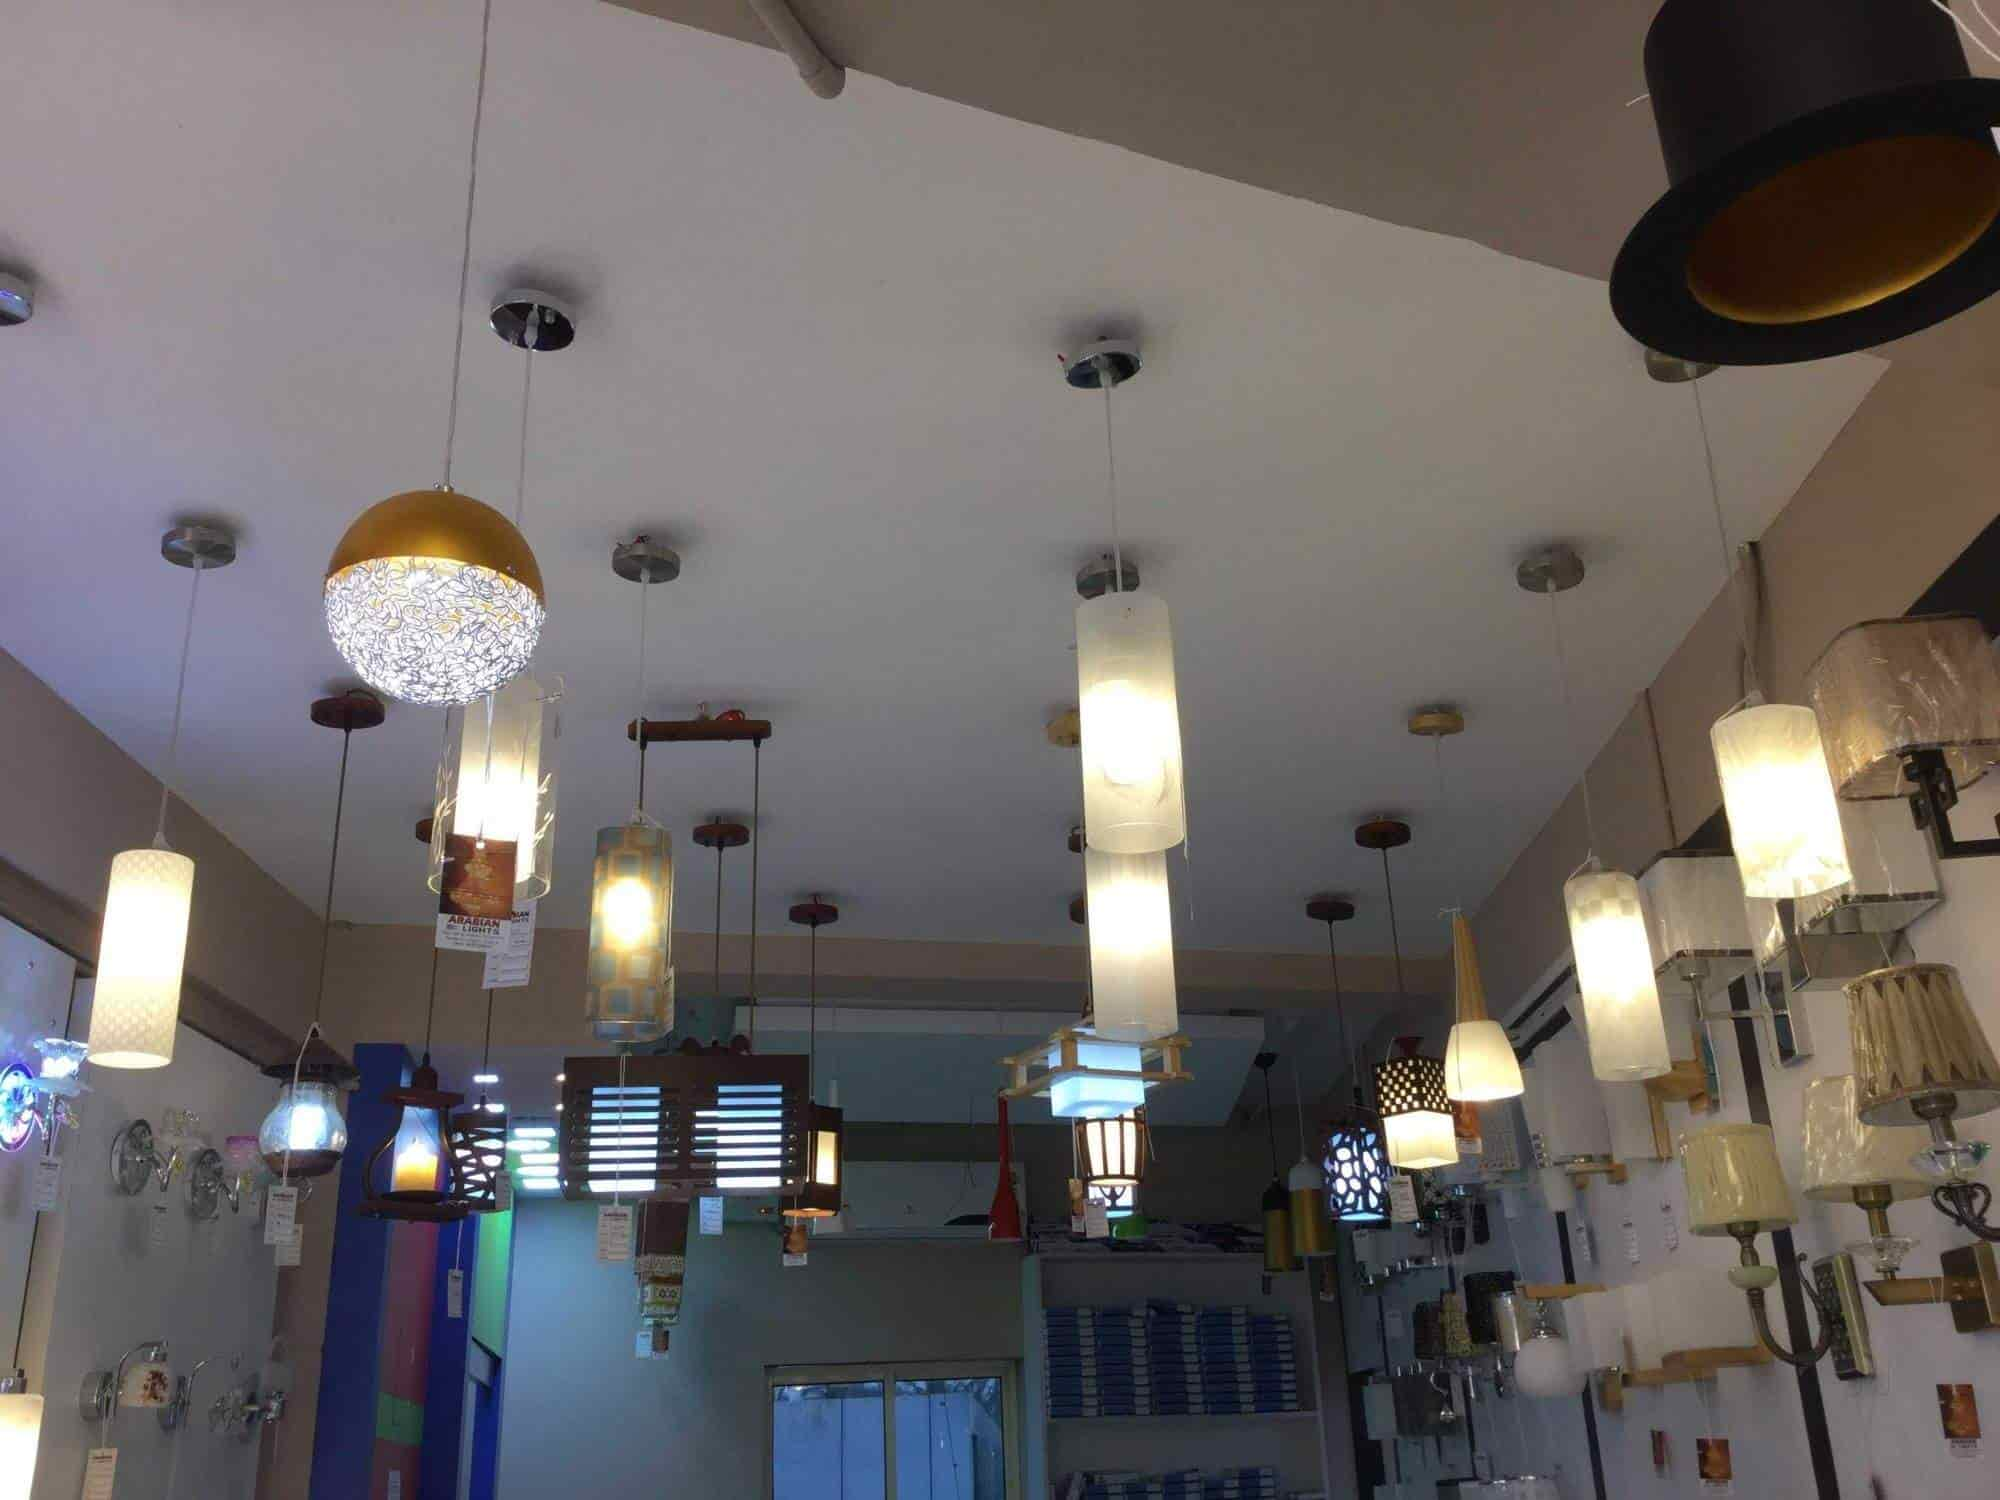 ball thai top decor balls light string rattan color lights diwali internet mixed hackerminded decorative